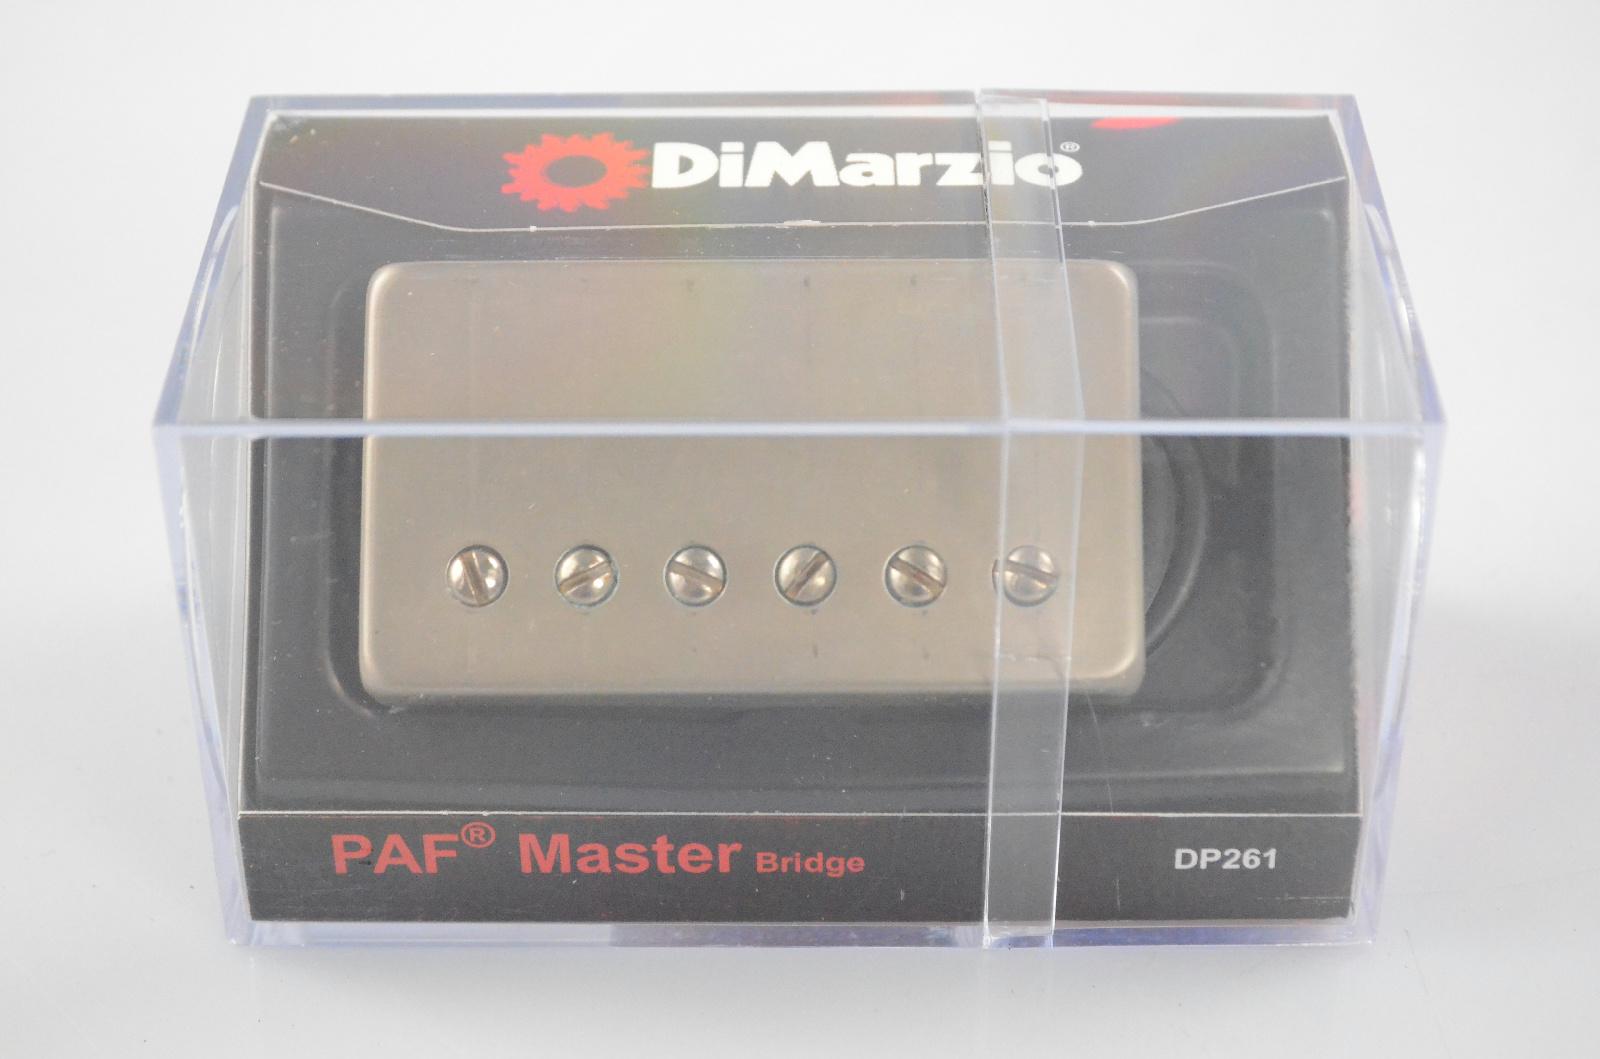 DiMarzio PAF Master Bridge DP261 Humbucker Guitar Pickup Worn Nickel 261 #32286